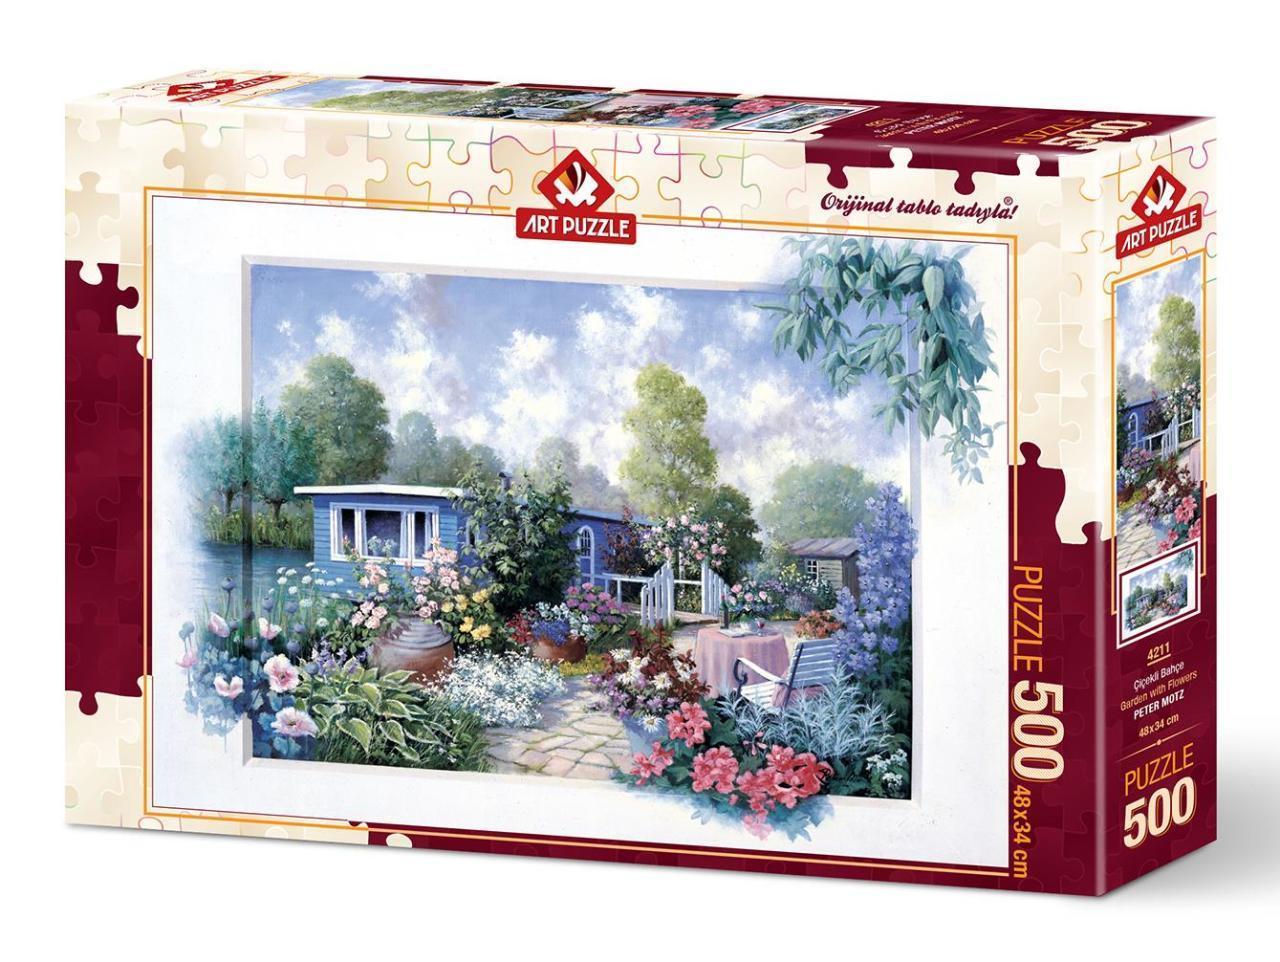 پازل 500 تکه آرت پازل طرح Garden With Flowers کد 4211